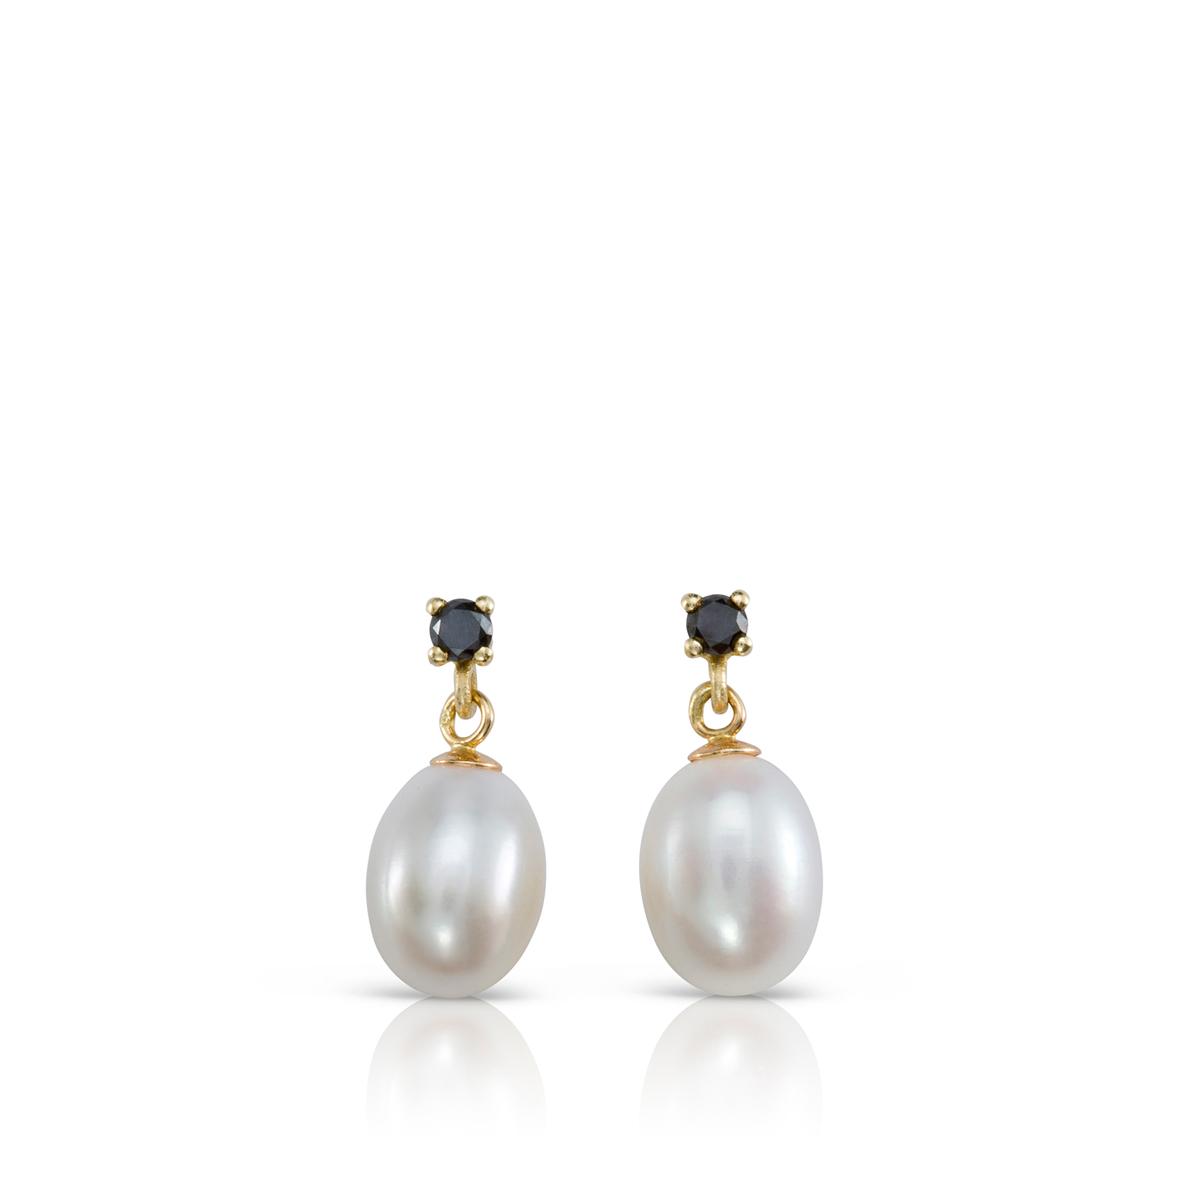 Dongle black Diamonds and pearl earrings